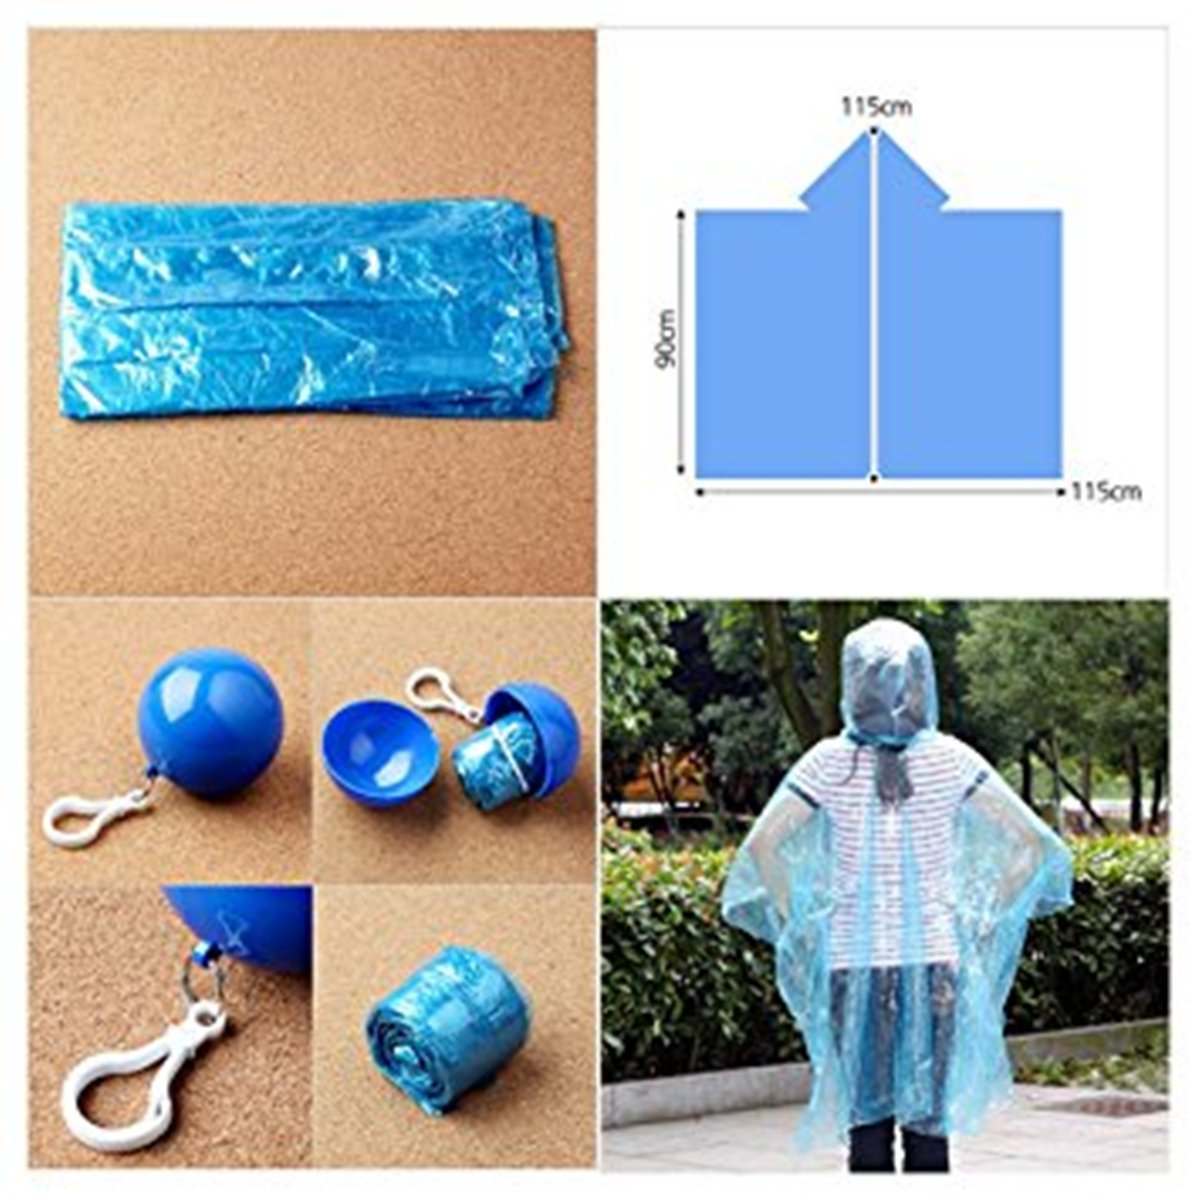 Disposable Emergency Raincoats Waterproof Raincoat Rain Poncho Colorful Set of Portable Hook Ball For Outdoor Activities Camping Mountaineering Travel Fishing 6 Packs WENHAOYU Portable Raincoat